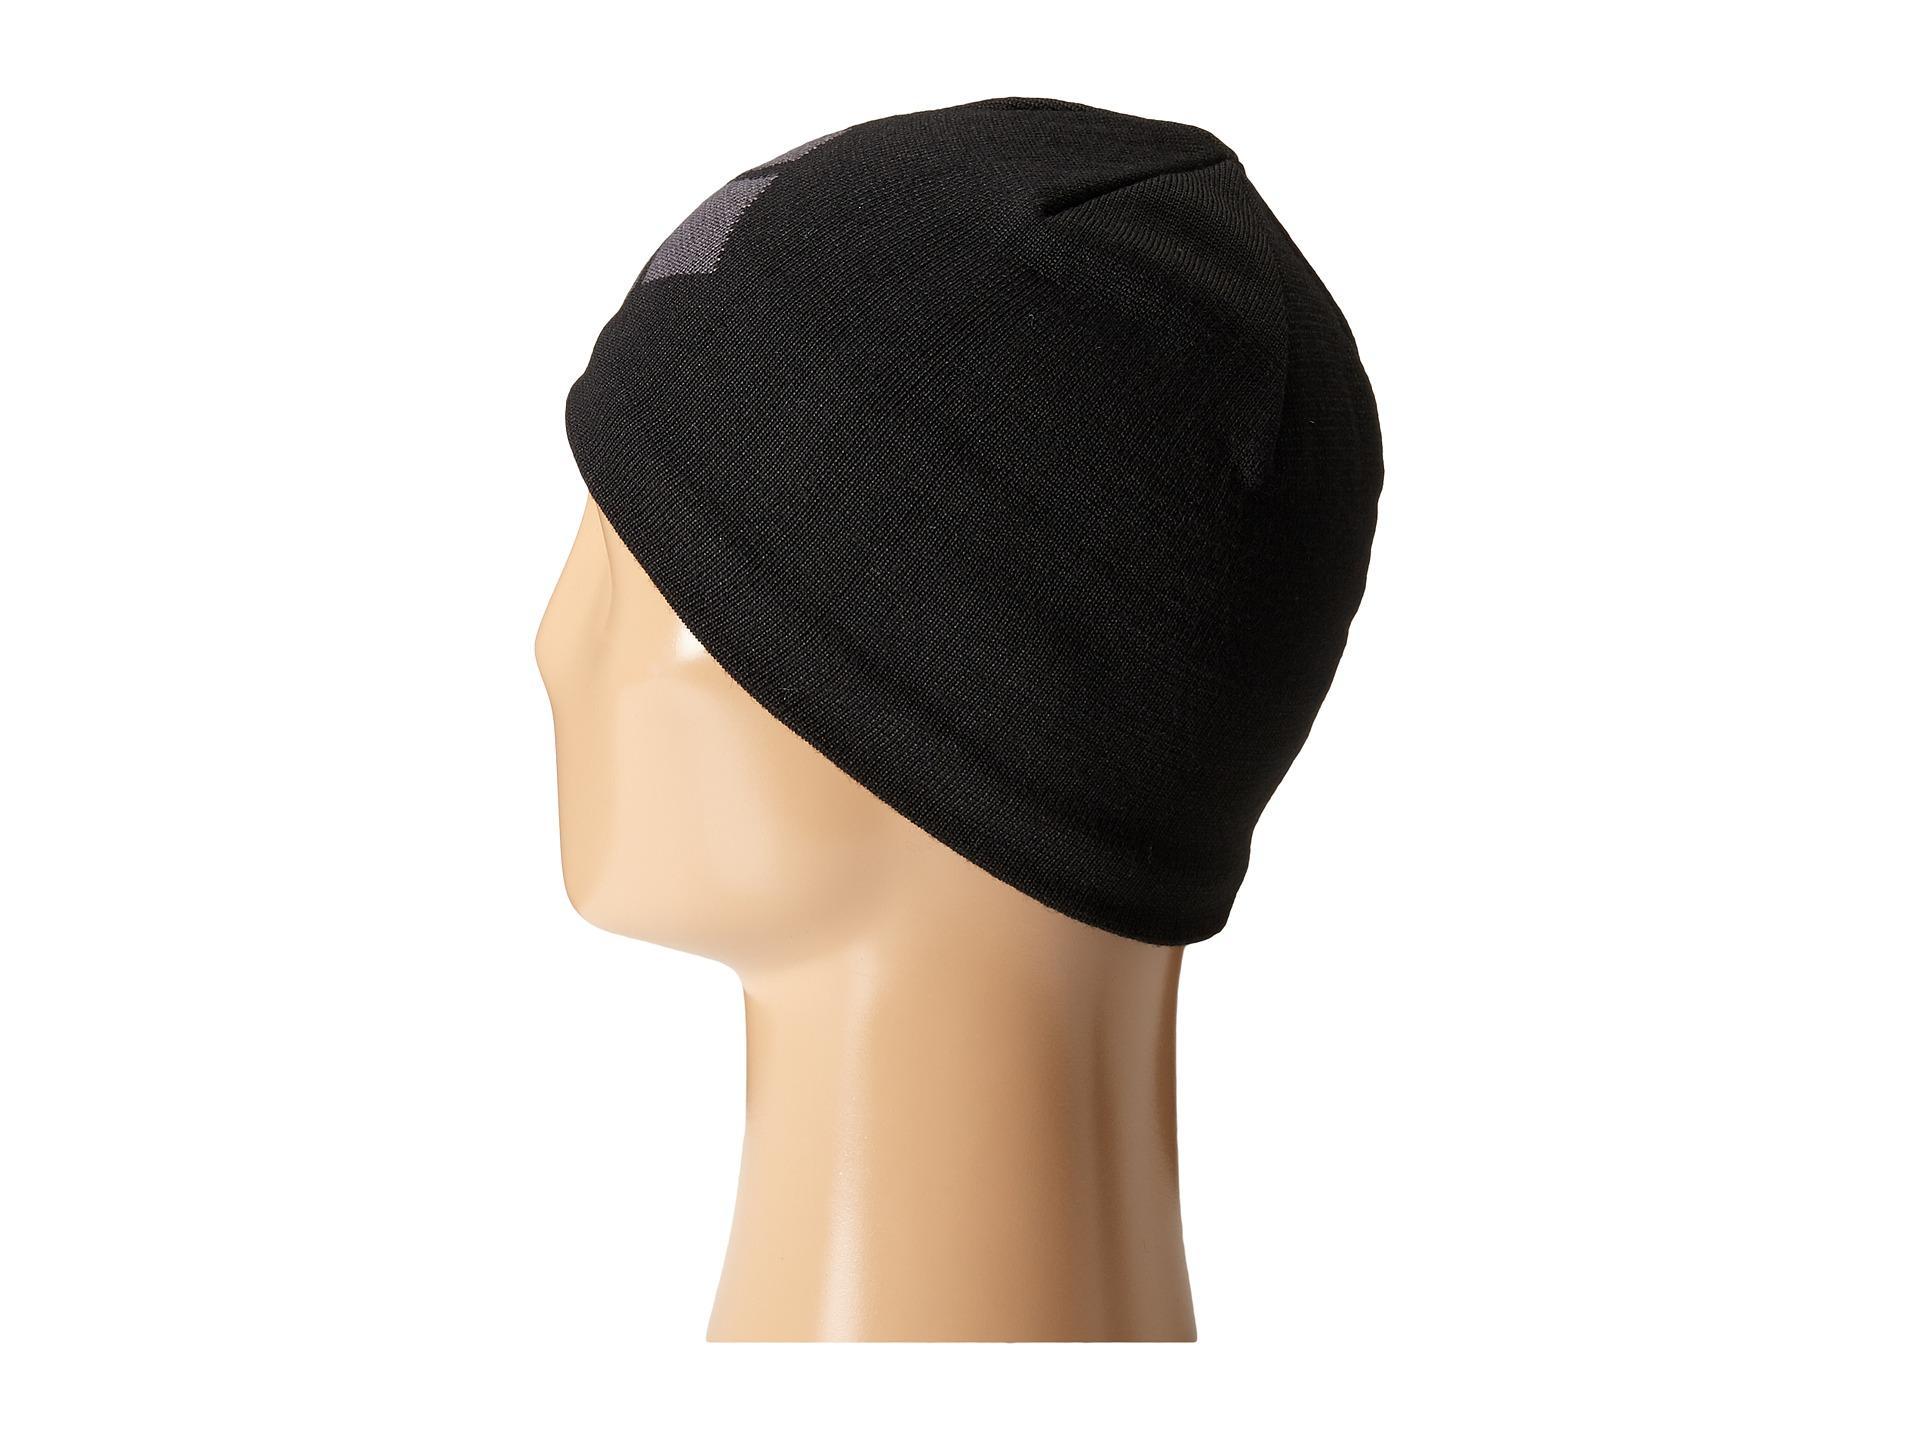 bcc56f1db73 Lyst - Black Diamond Torre Wool Beanie Update in Black for Men